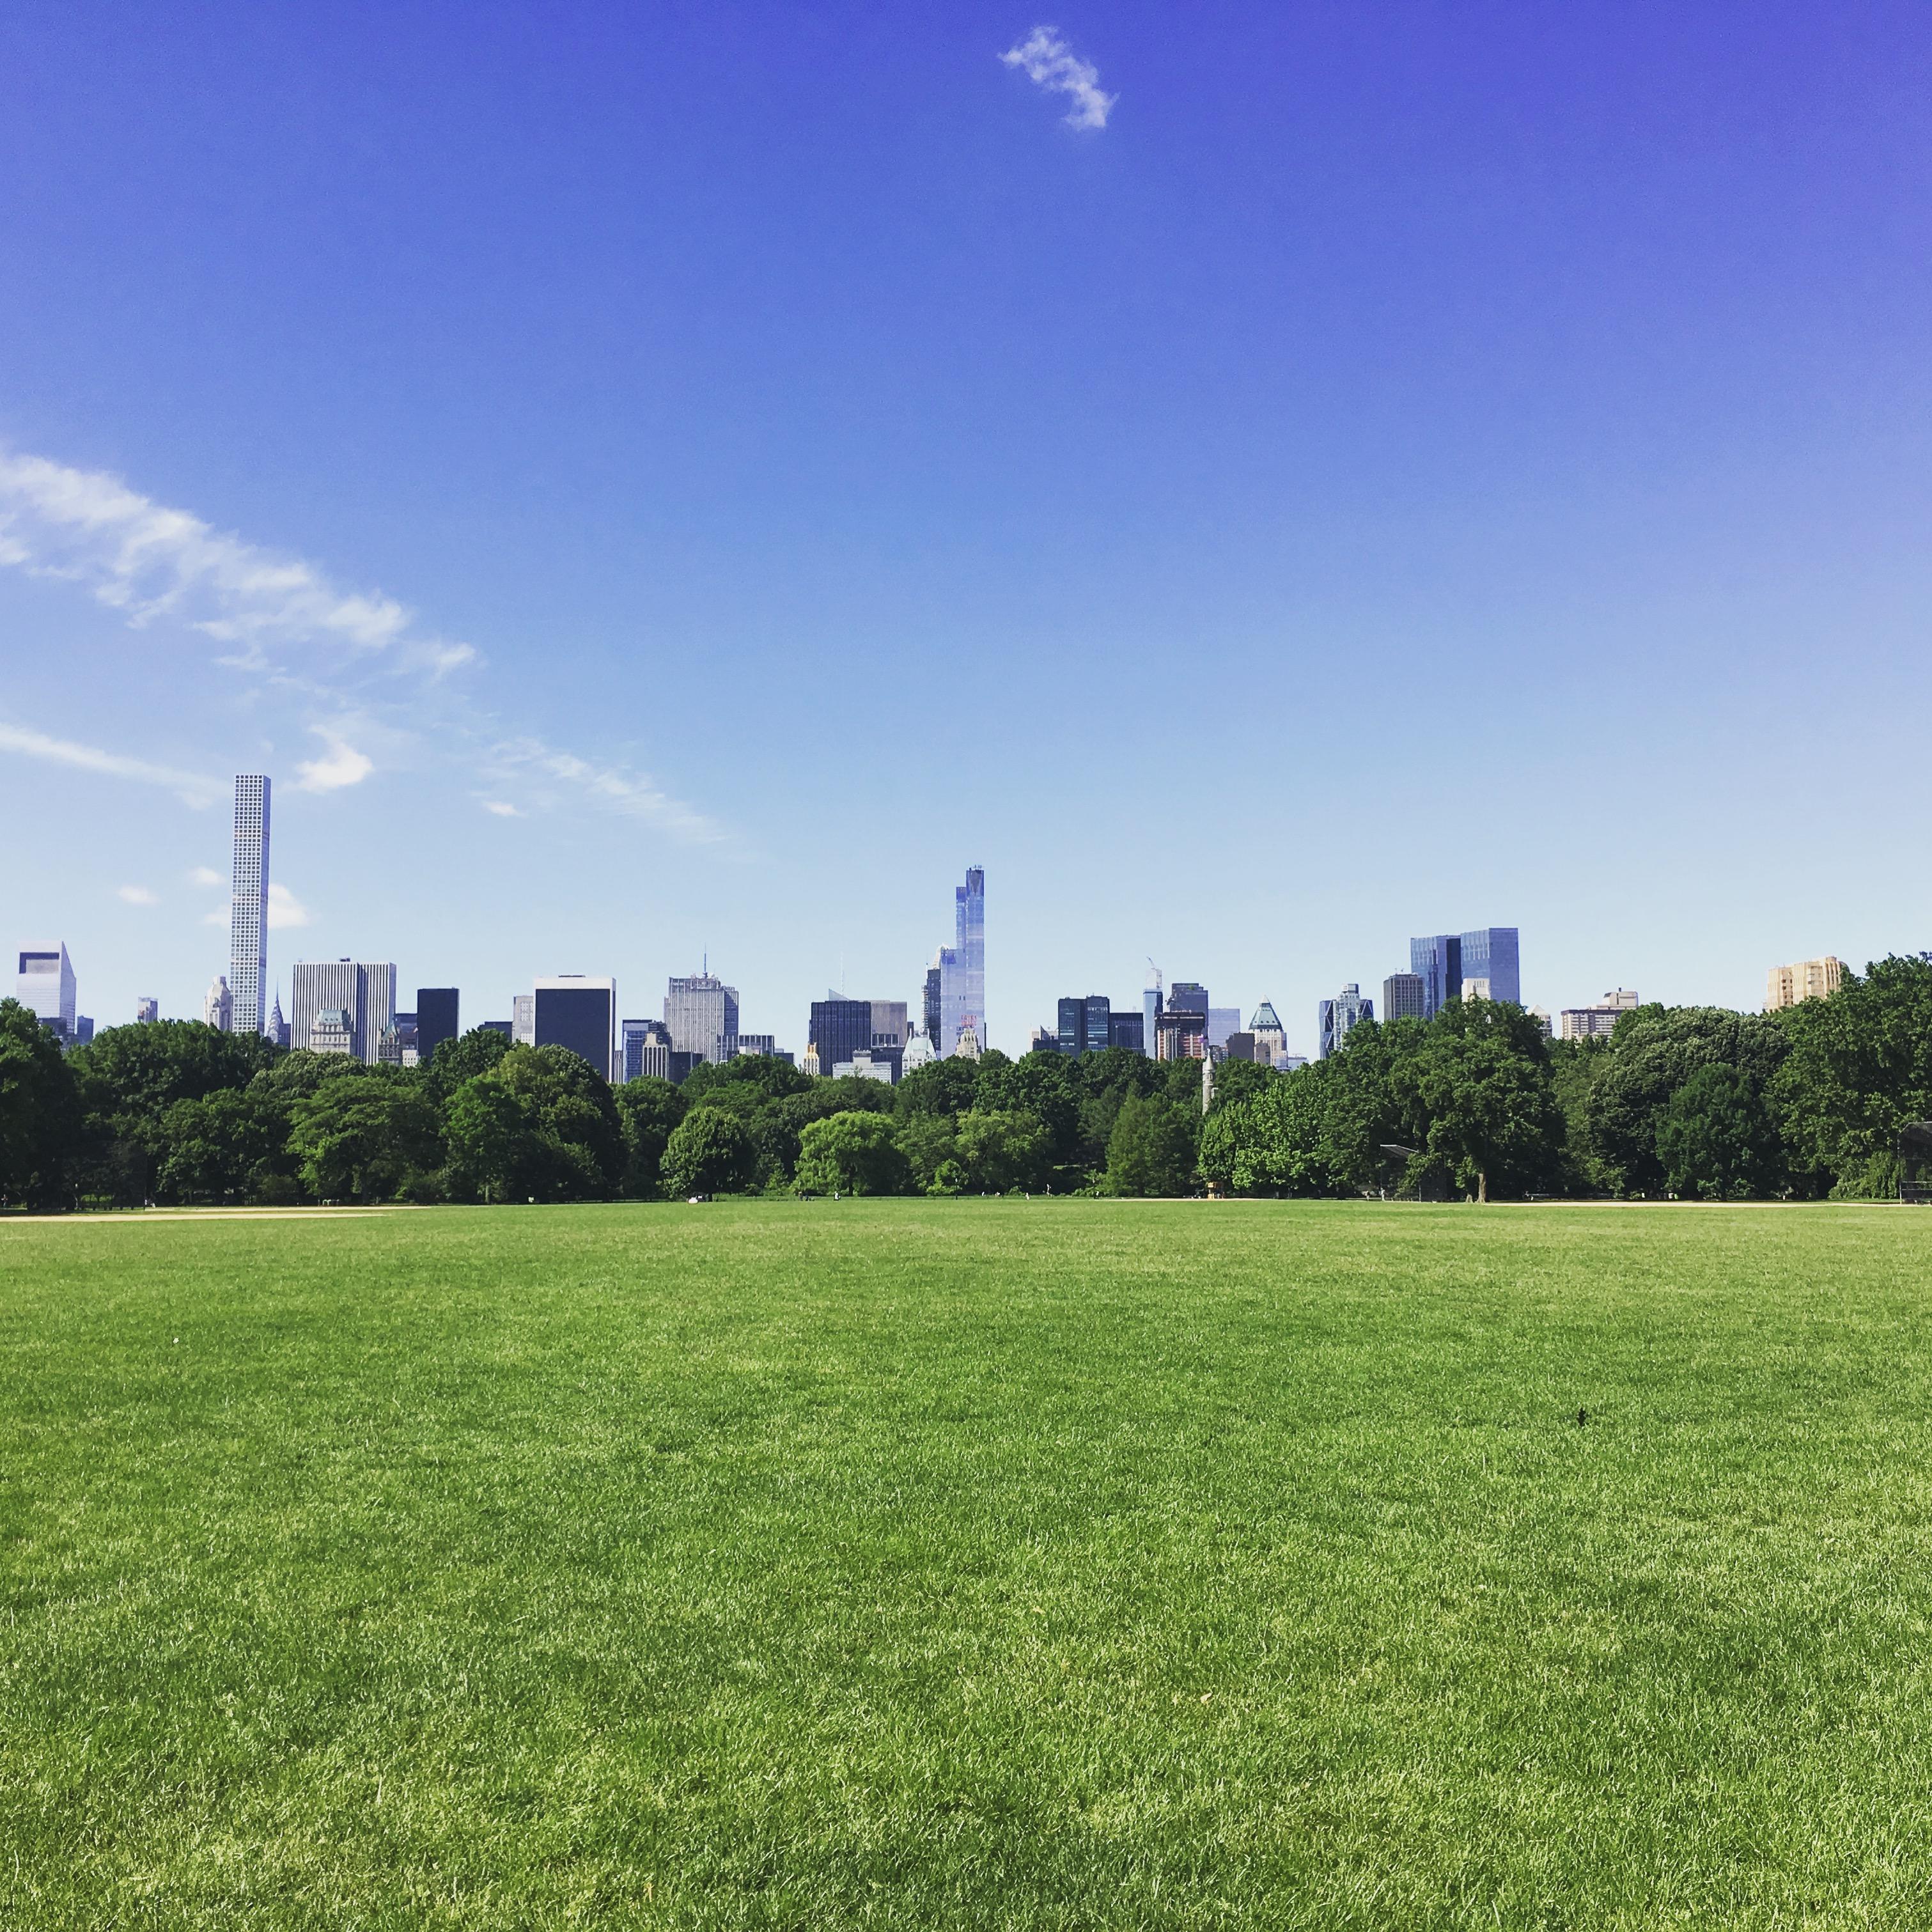 Aussicht in Central Park New York City